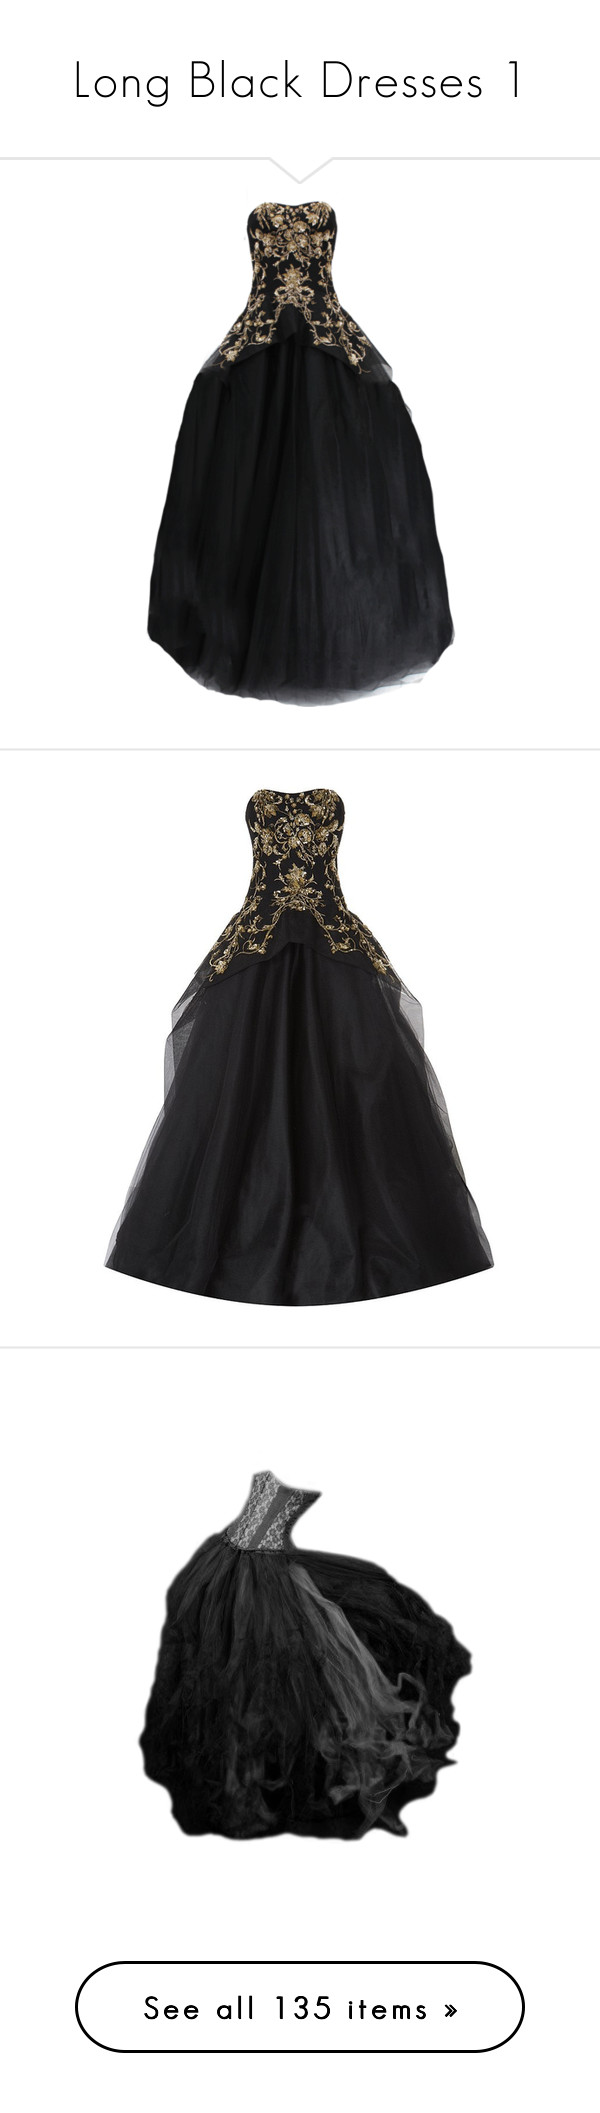 Long black dresses